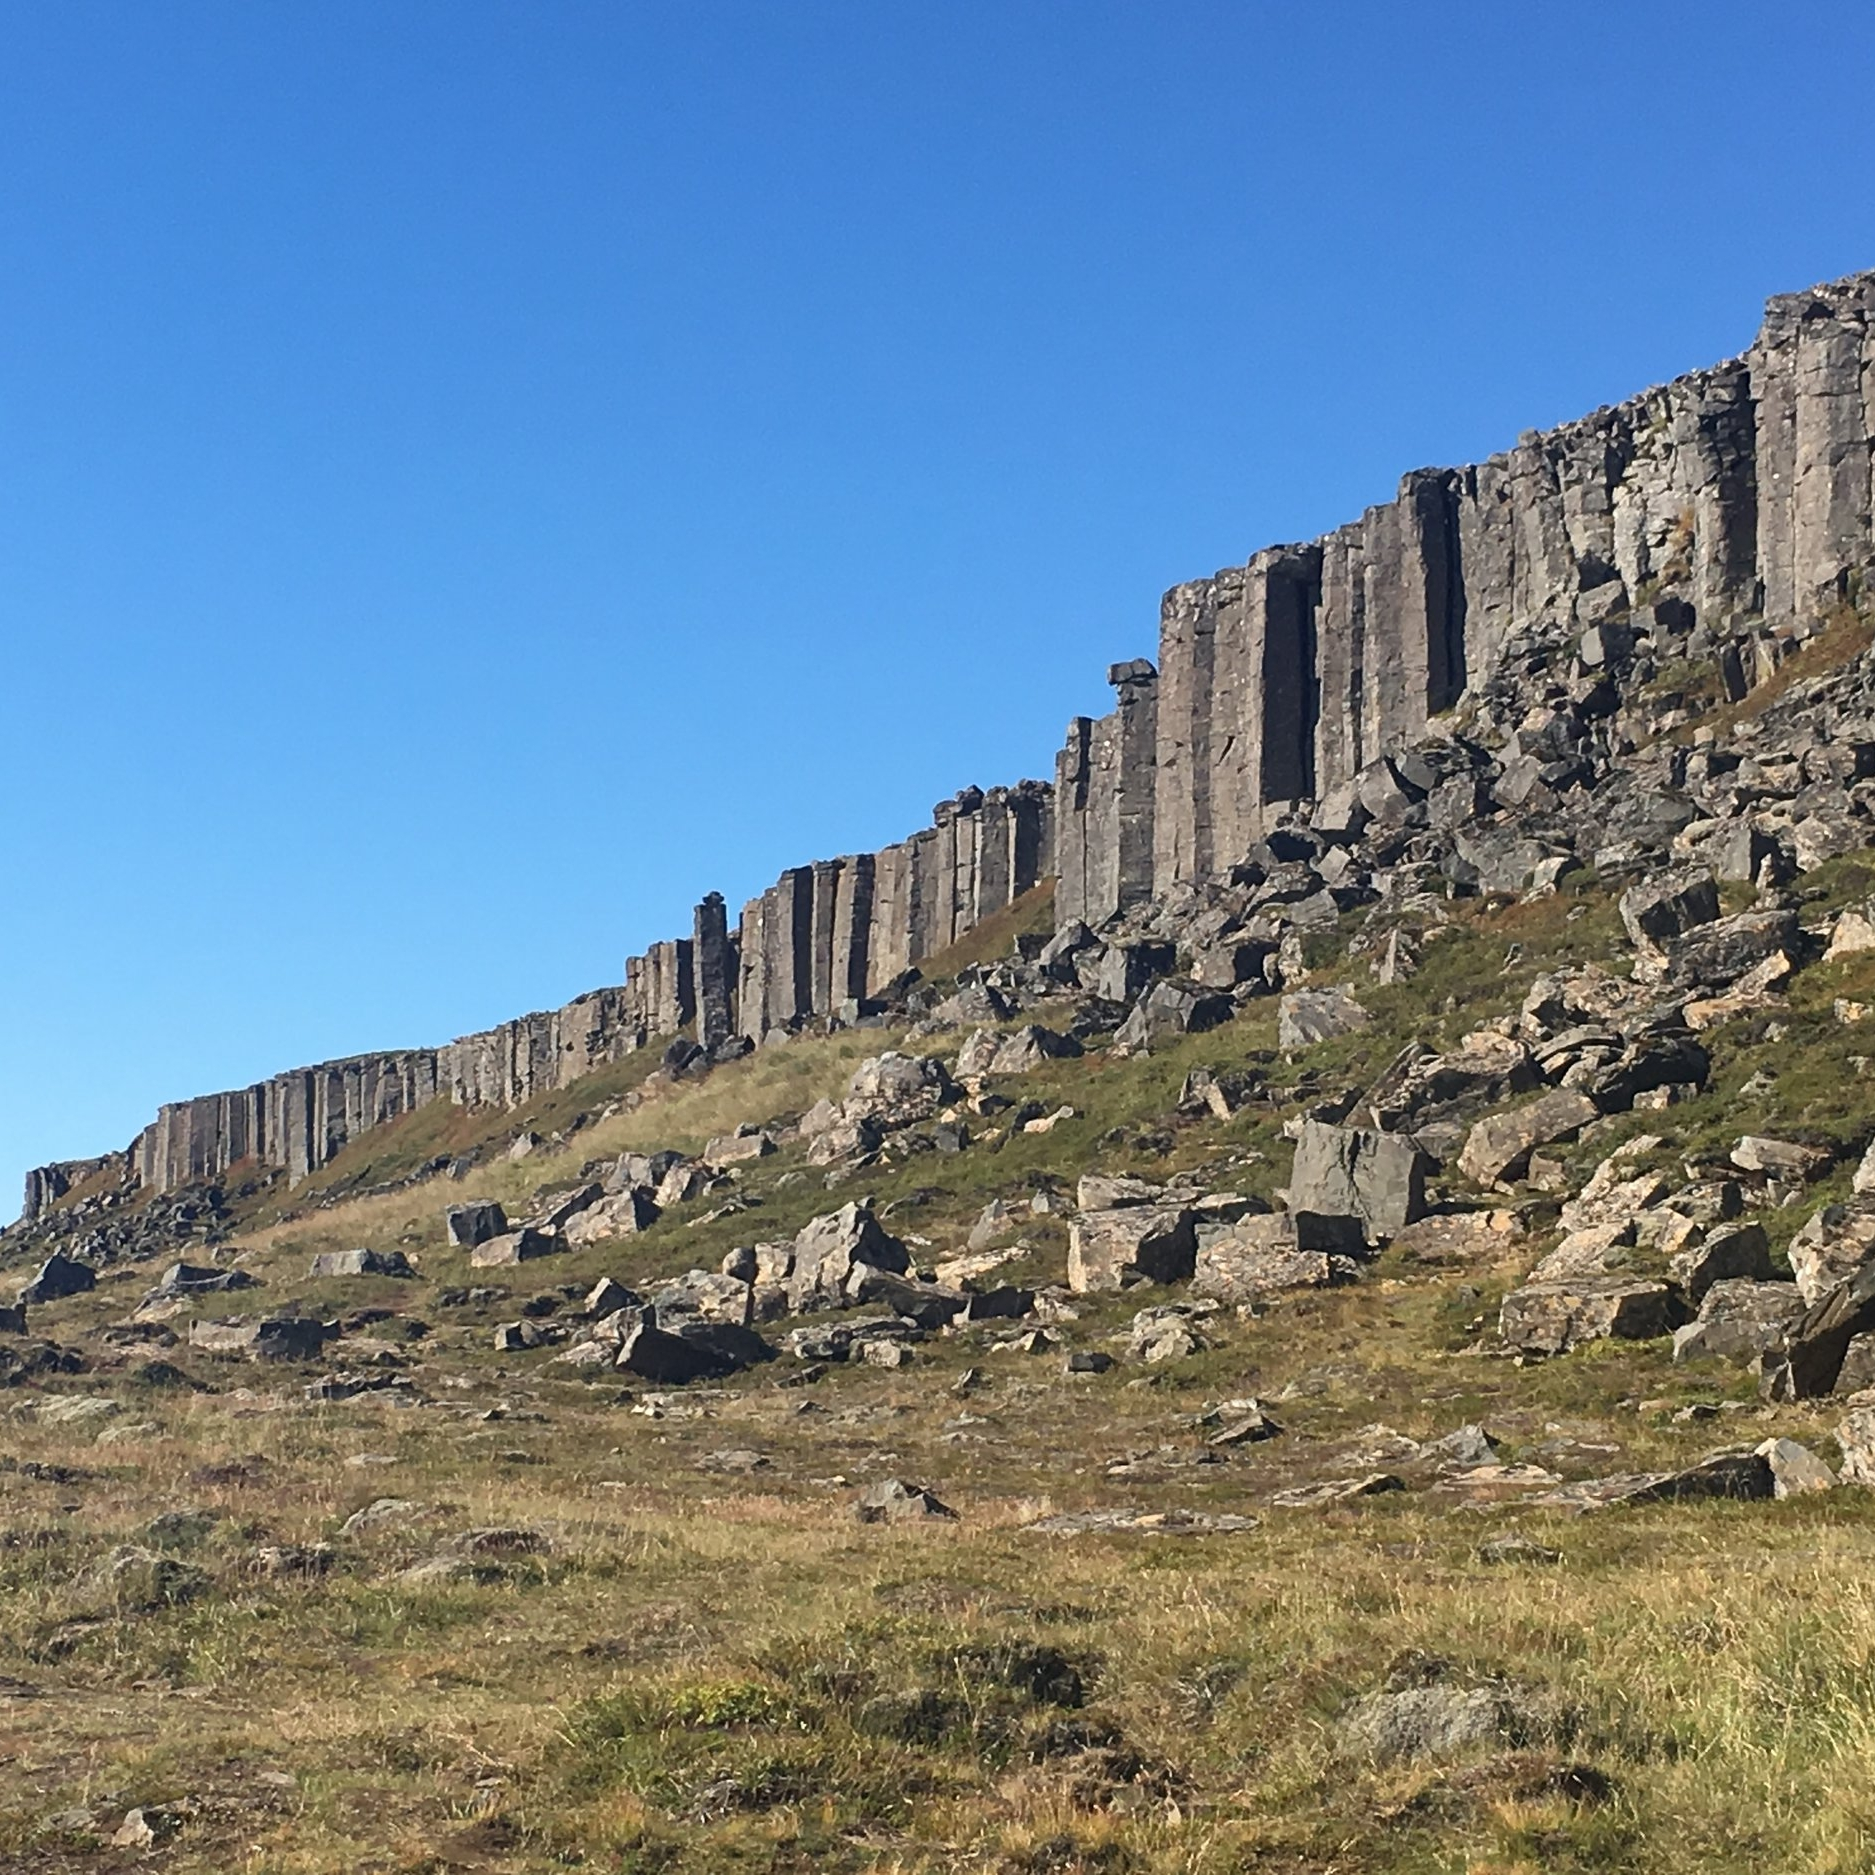 Basalt columns, Iceland by The Doubtful Traveller